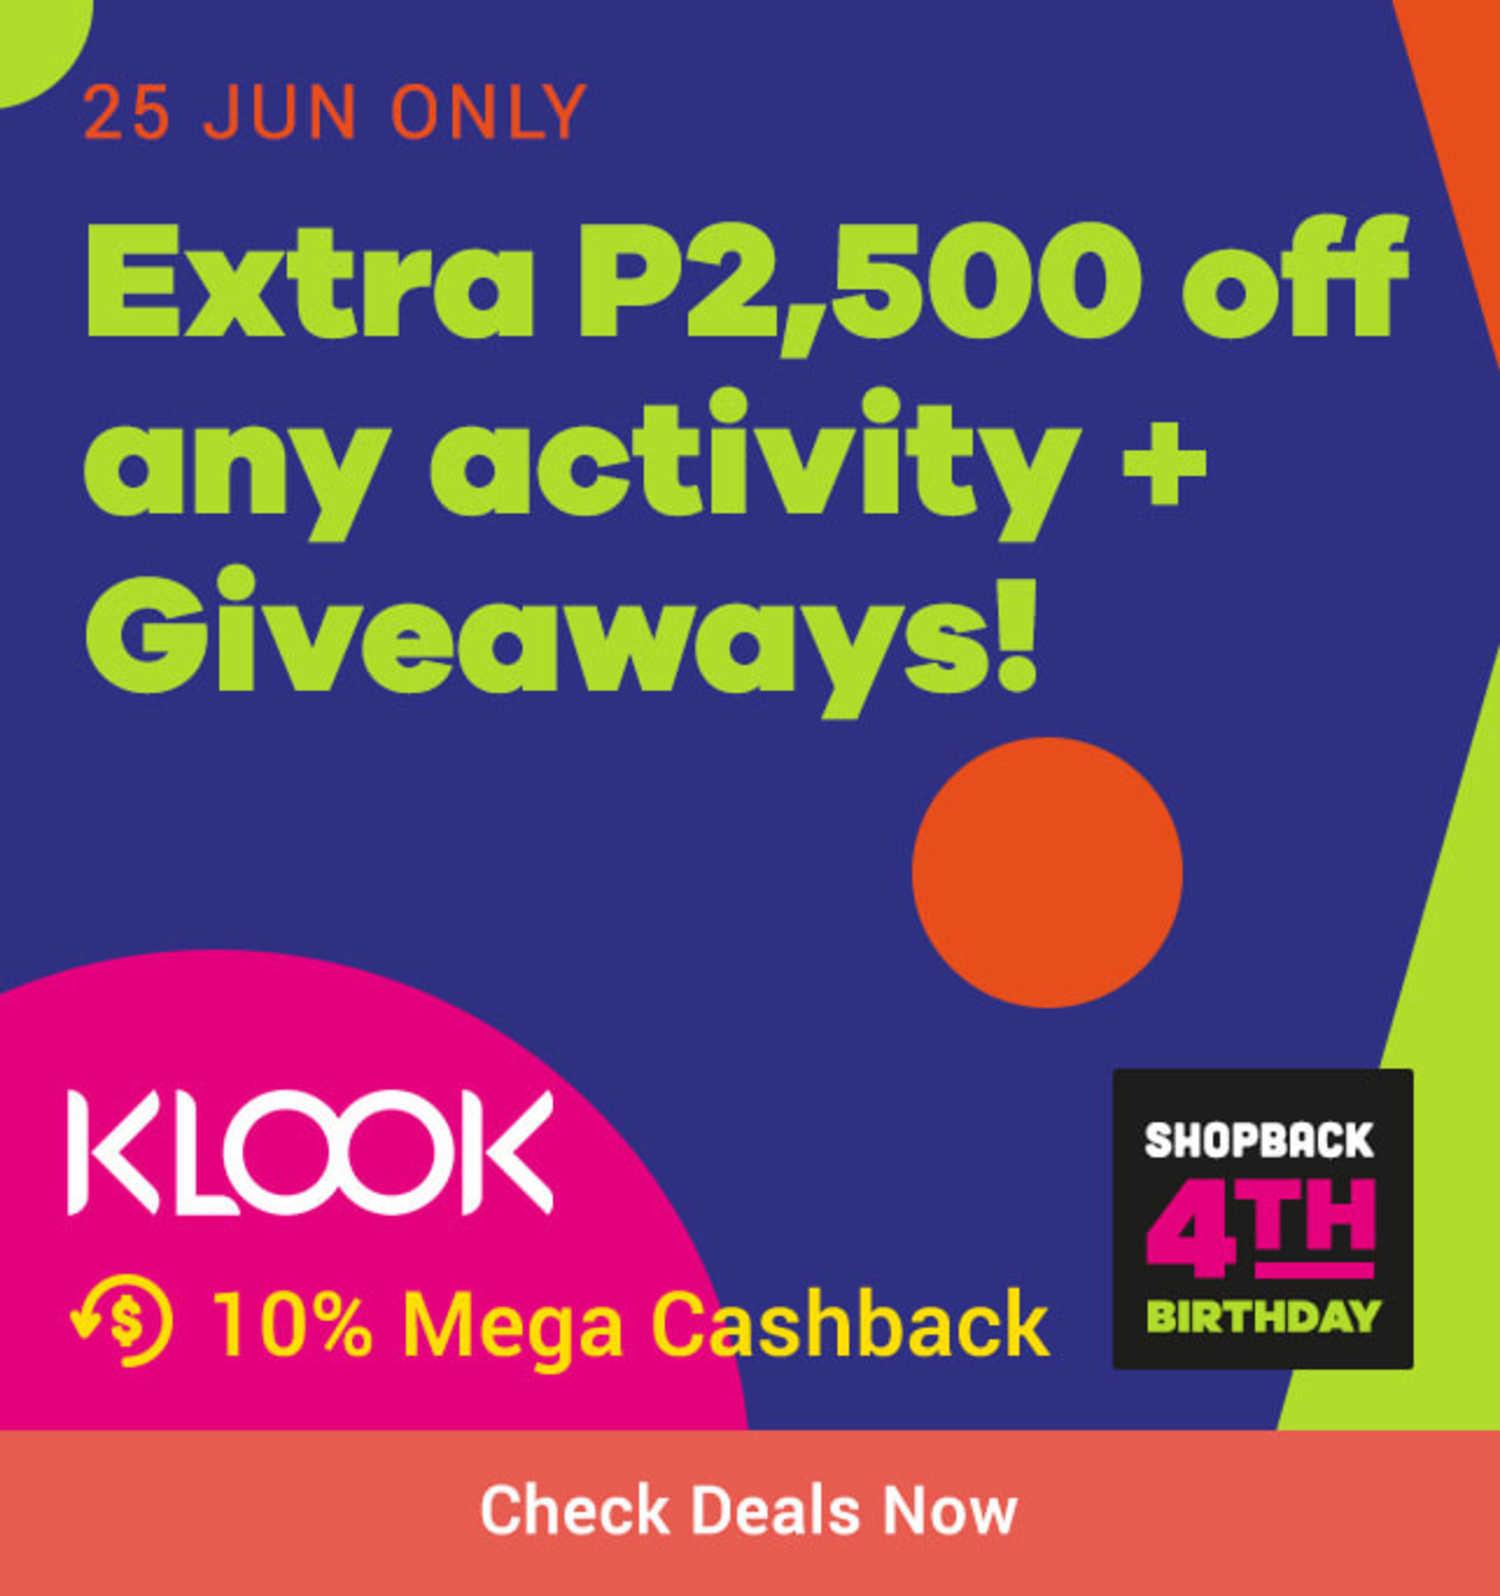 25 Jun Only | Extra P2,500 off on KLOOK activity + 10% Mega Cashback